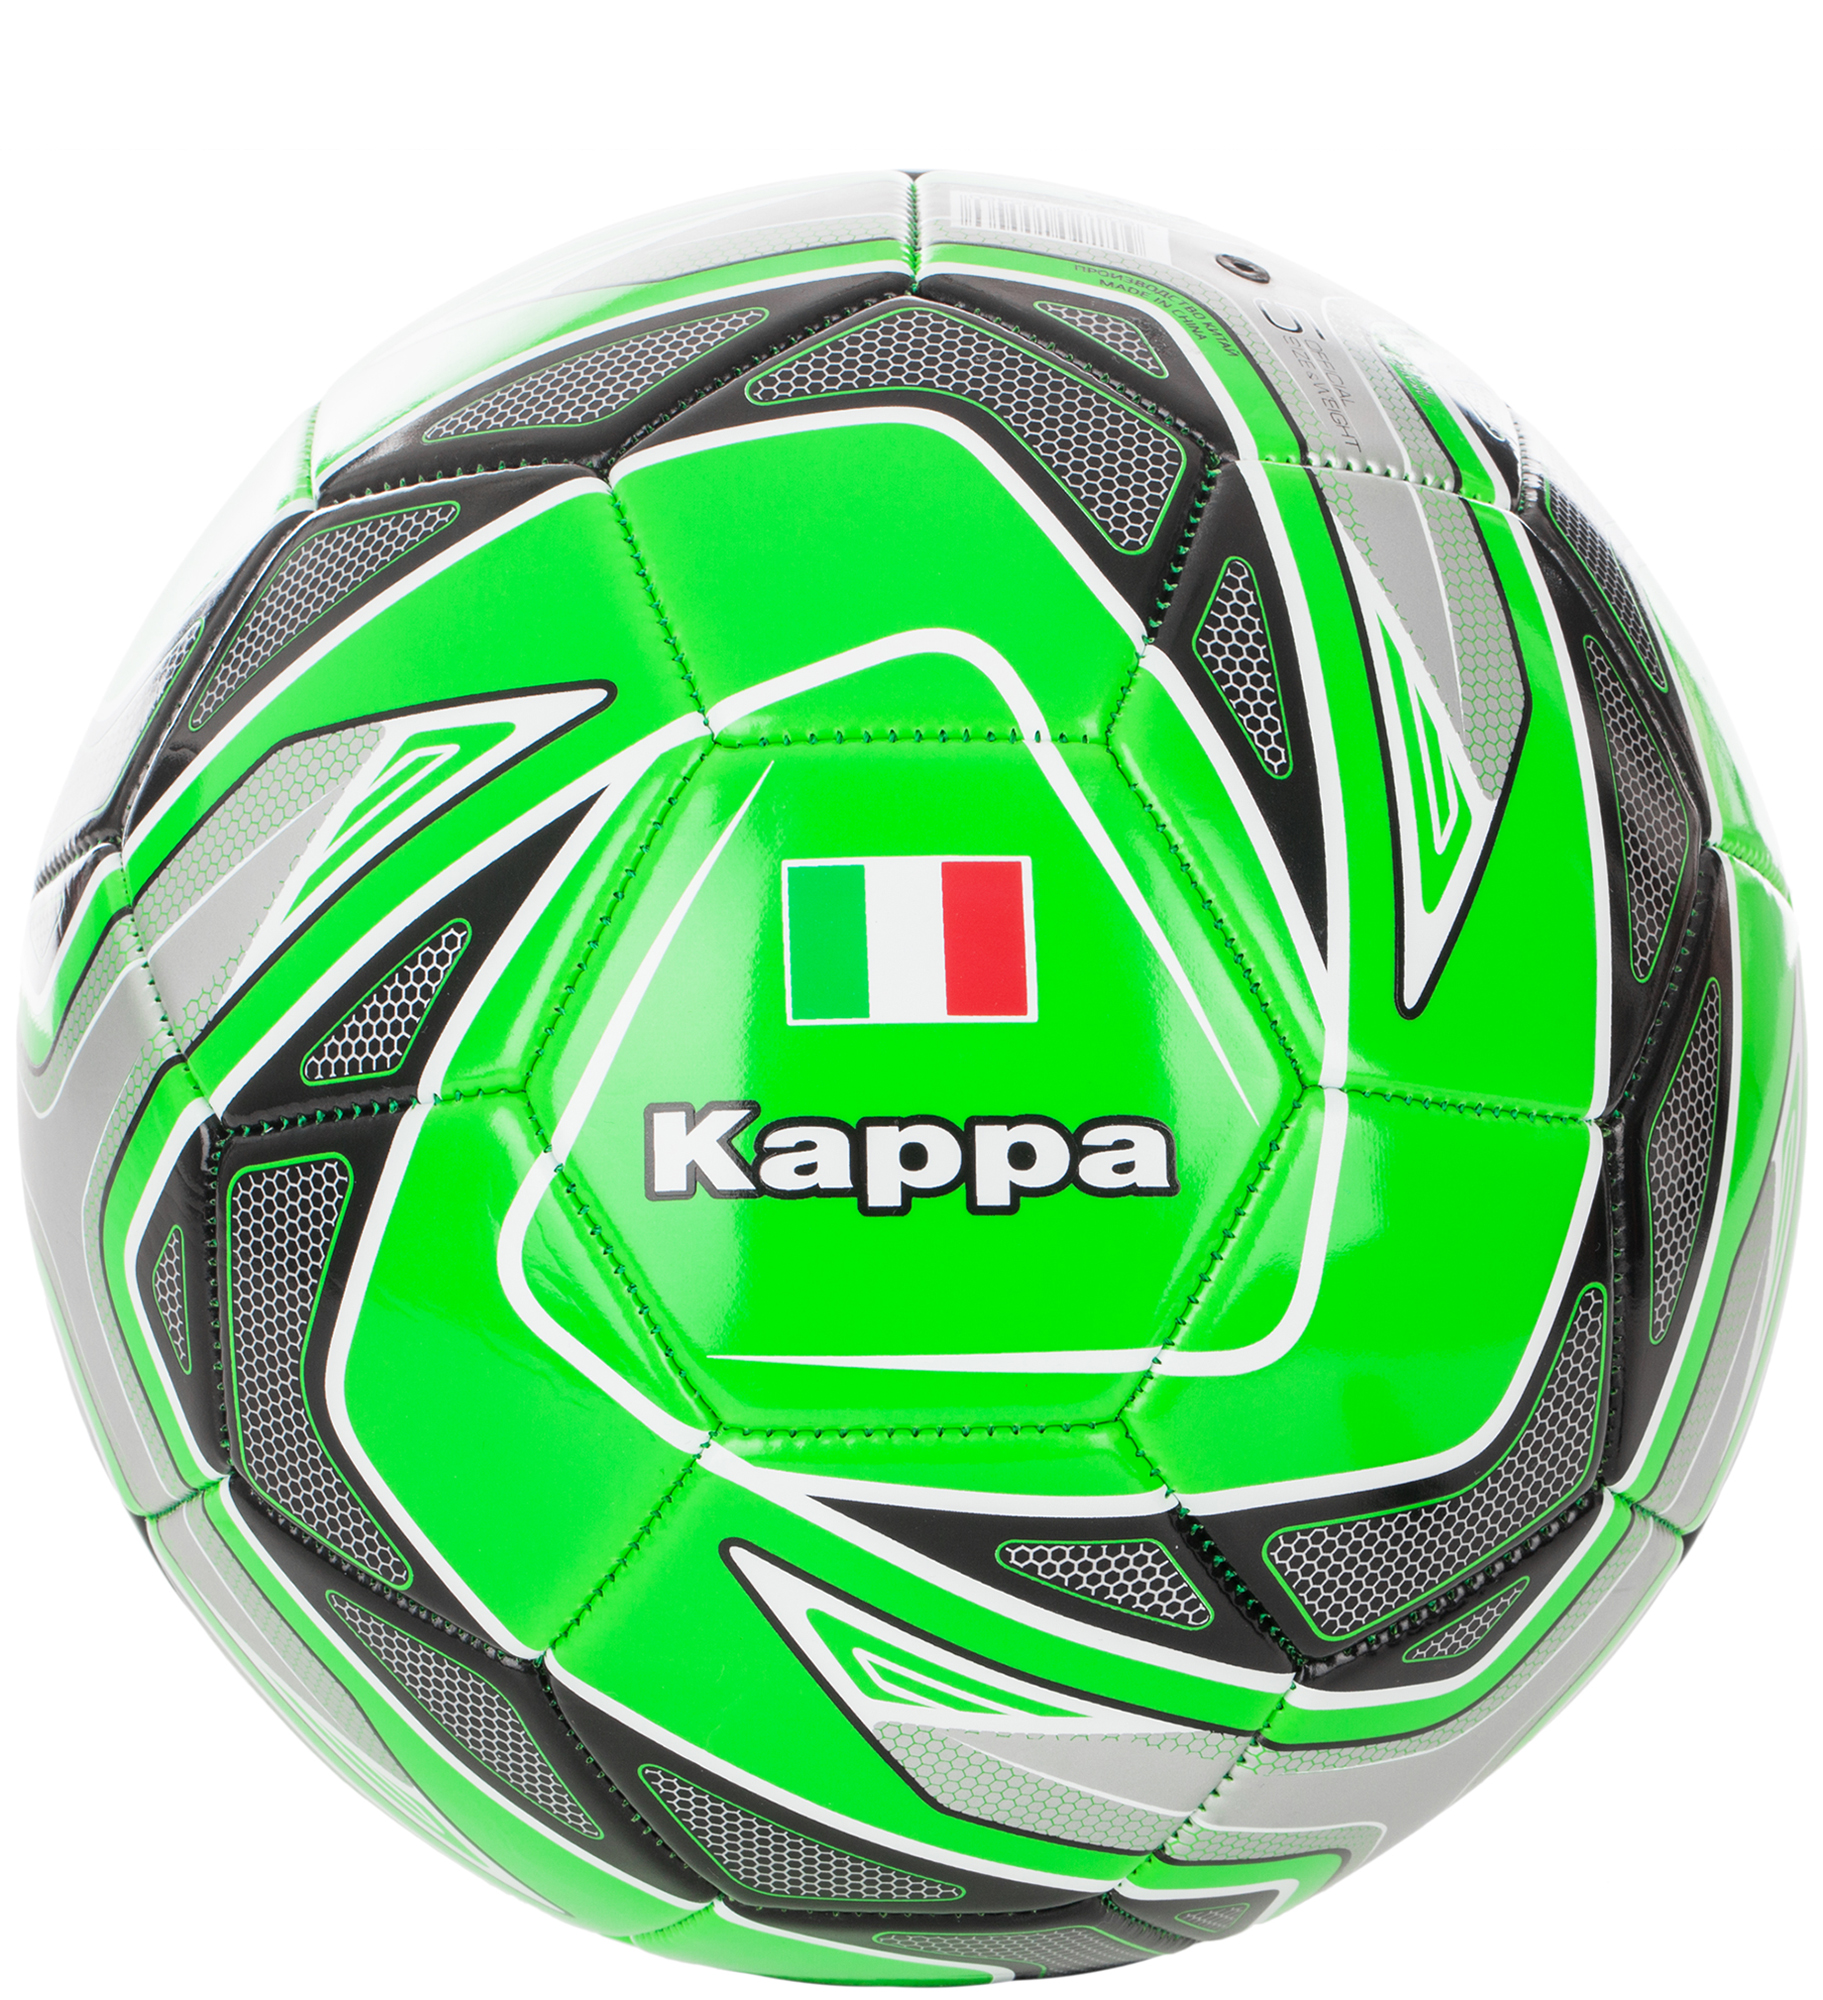 Kappa Мяч футбольный Kappa infinity kappa 1200w